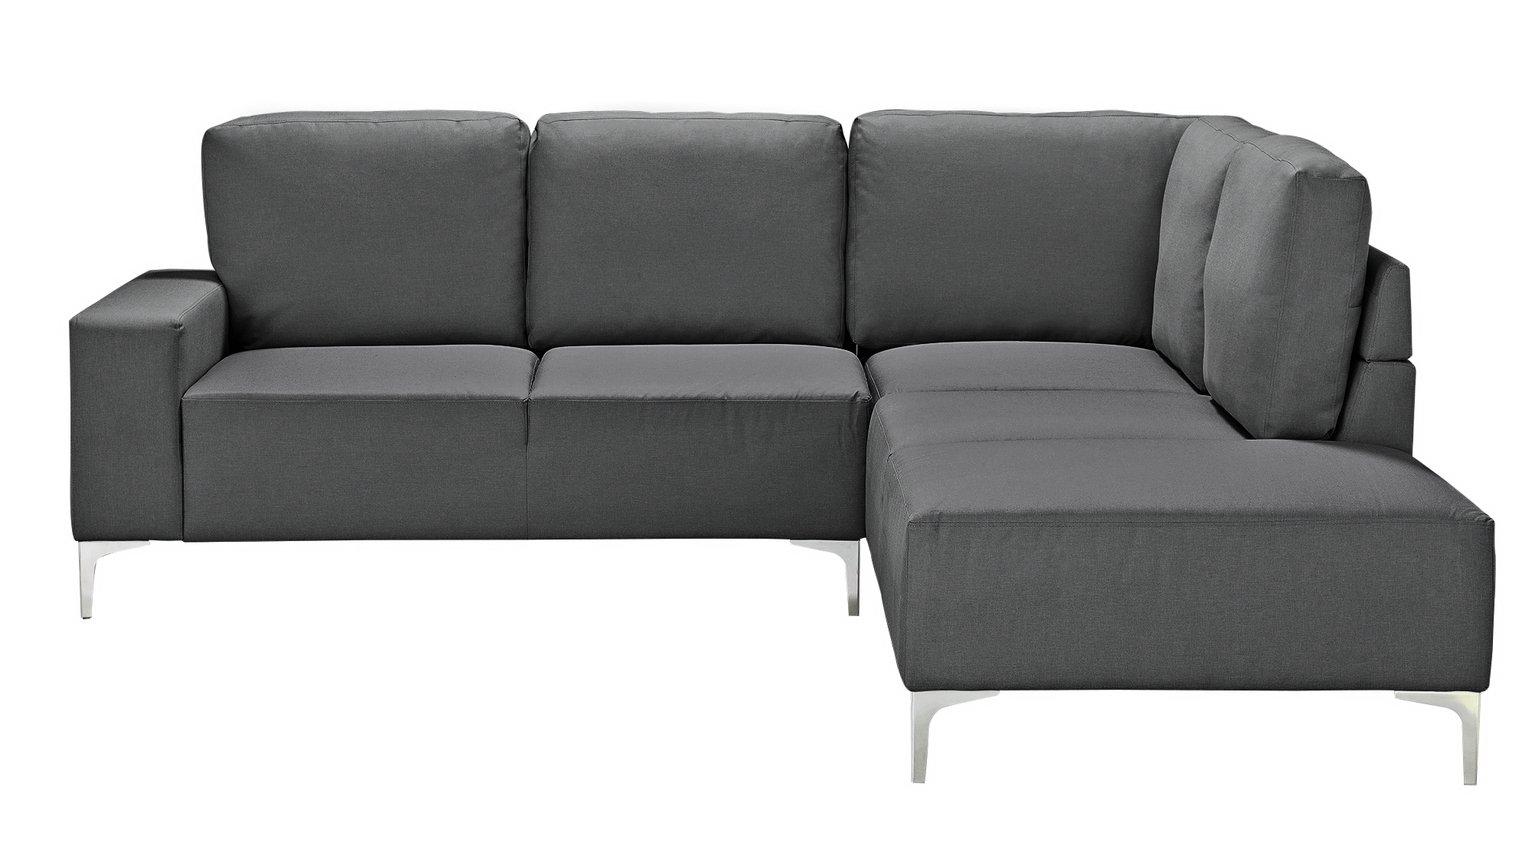 Argos Home Hale Right Corner Fabric Sofa - Charcoal